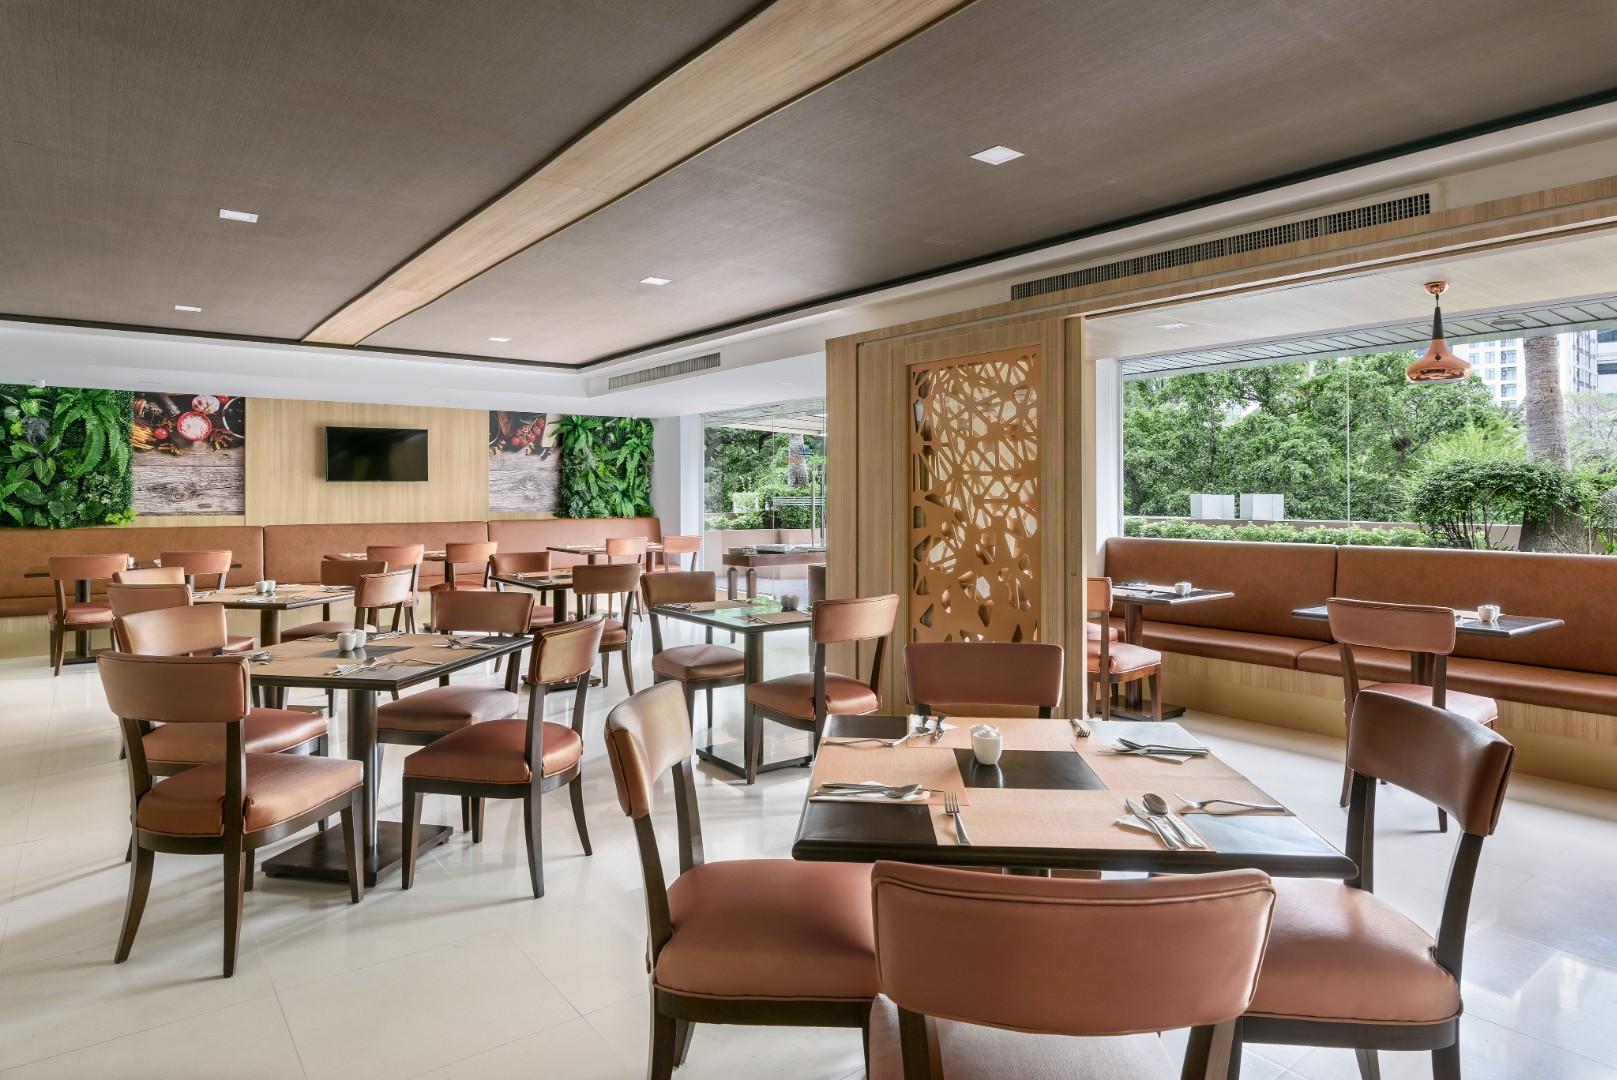 201907 Adelphi Grande Sukhumvit Hotel - Cafe Grande Restaurant A.jpg